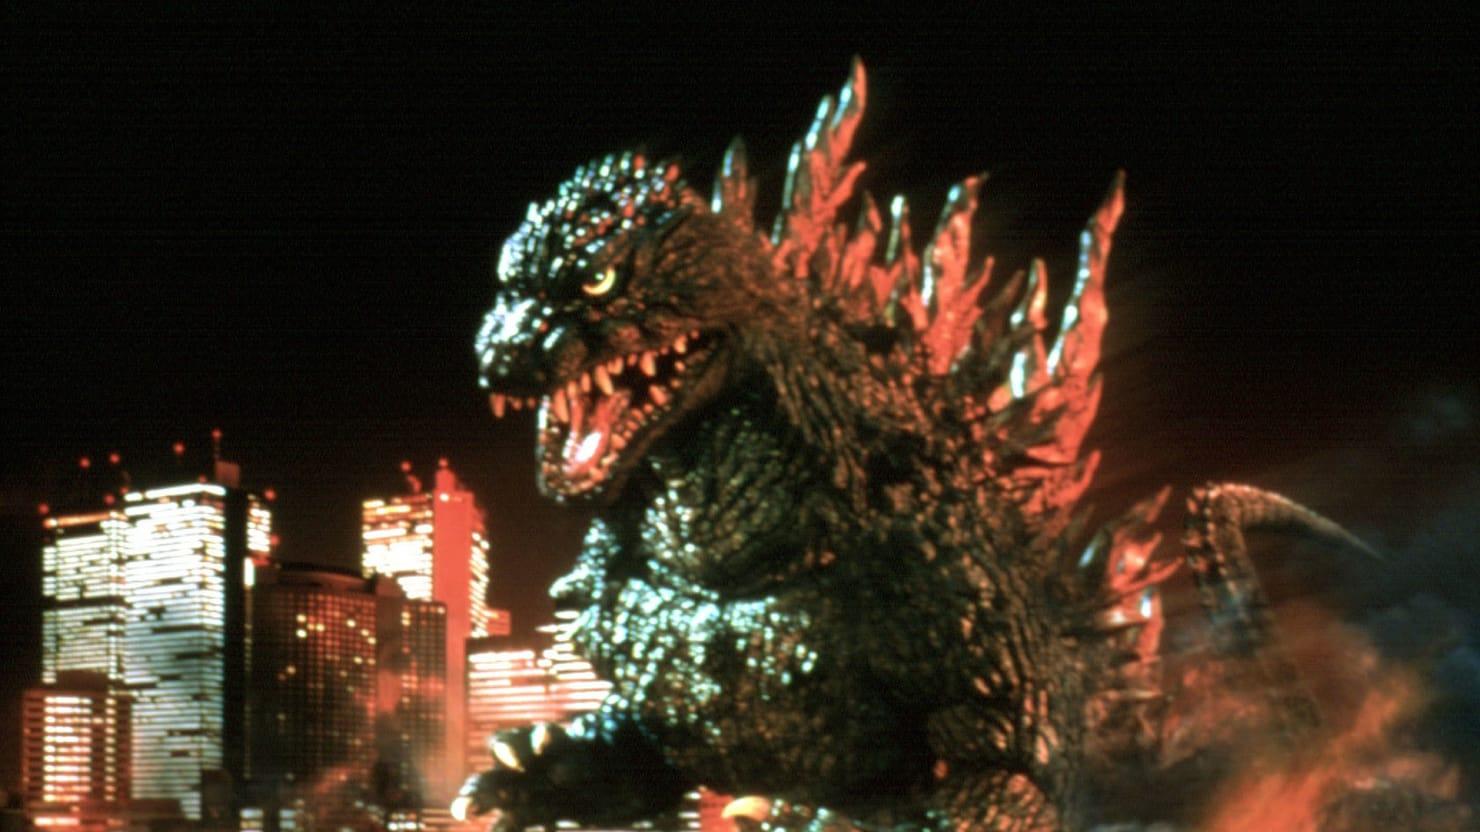 a comprehensive history of toho s original kaiju and atomic